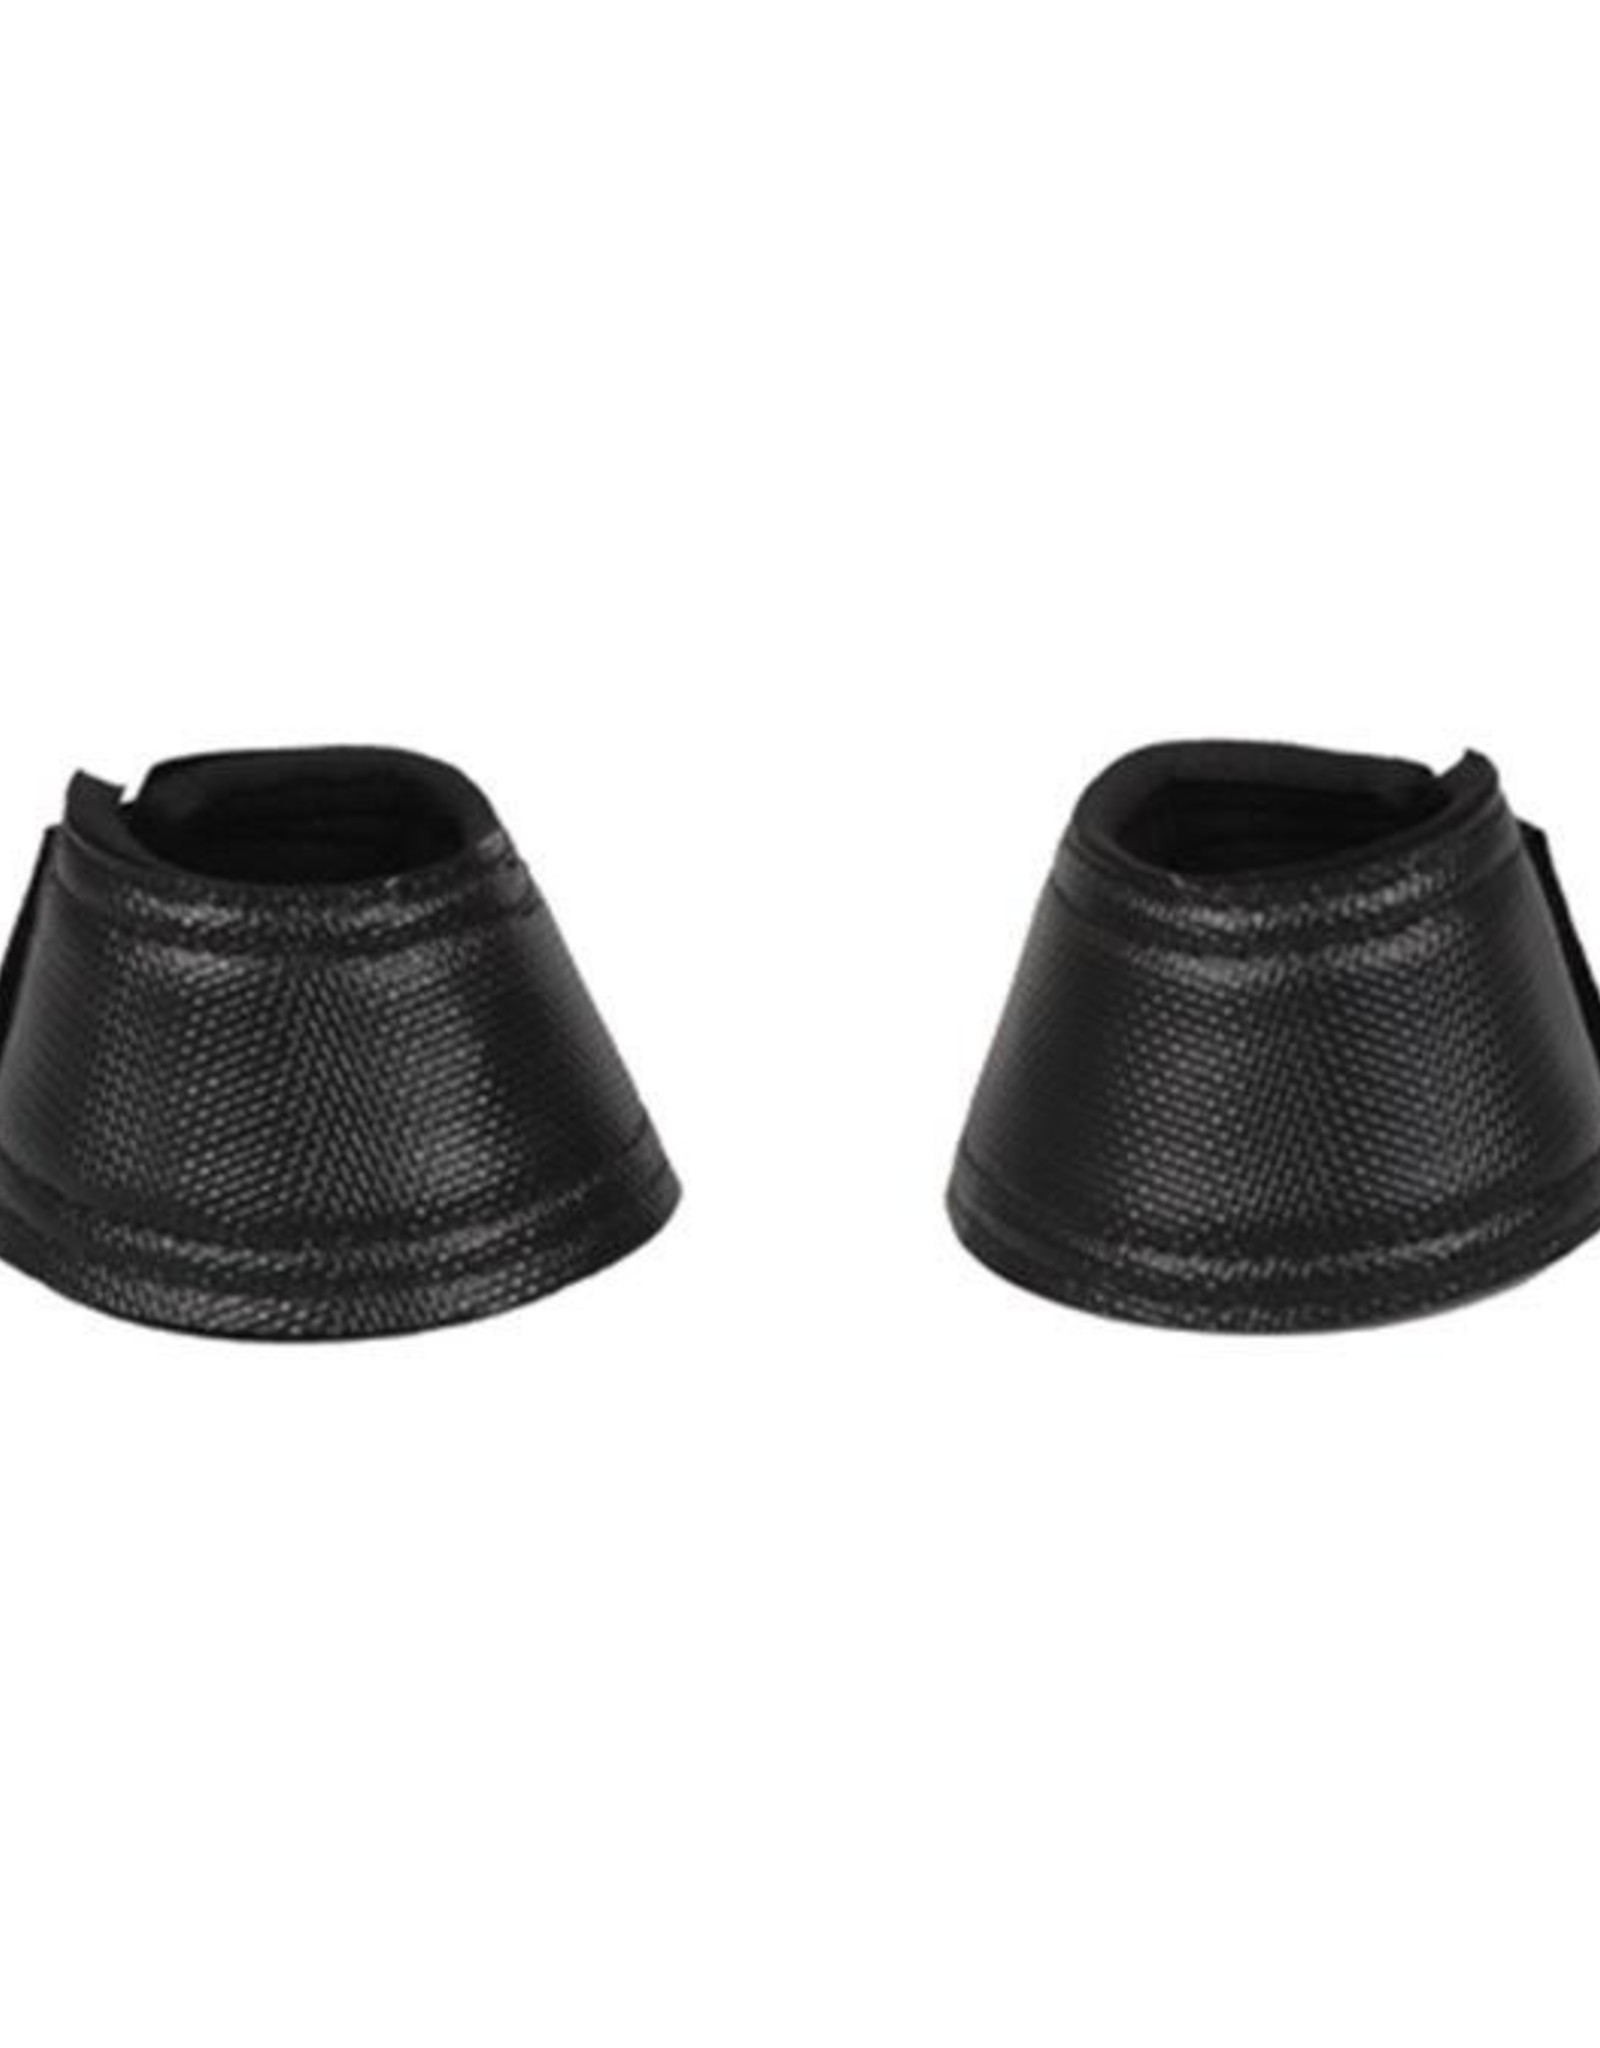 Jacks Miniature Bell Boots